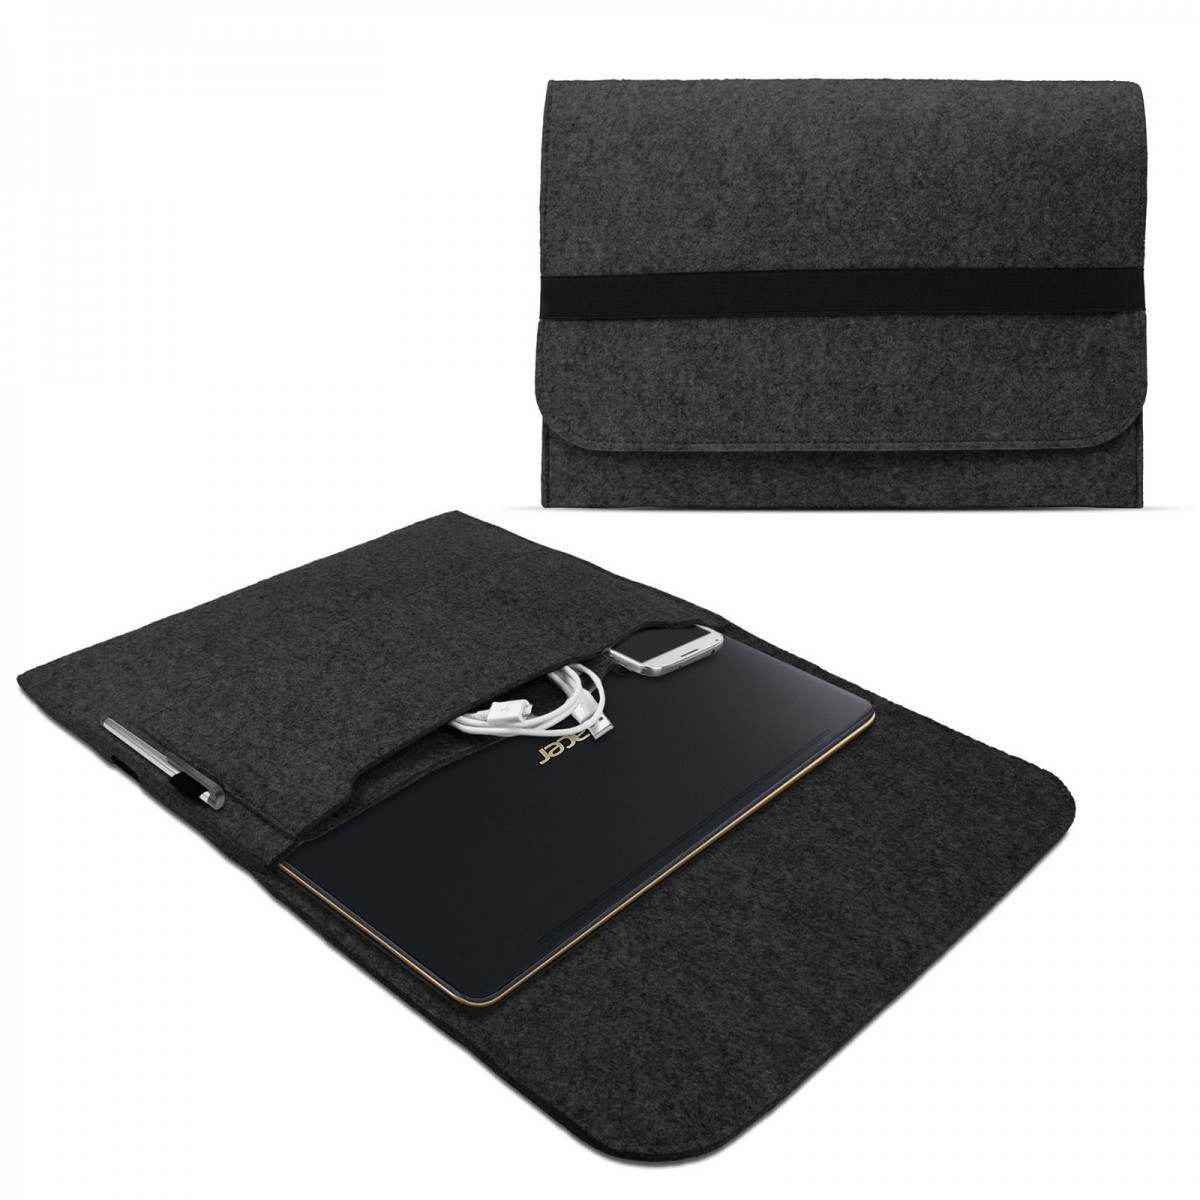 IPad mini 4, apple (RU) M: MoKo iPad Mini 4, case Buy iPad mini 4 - Apple